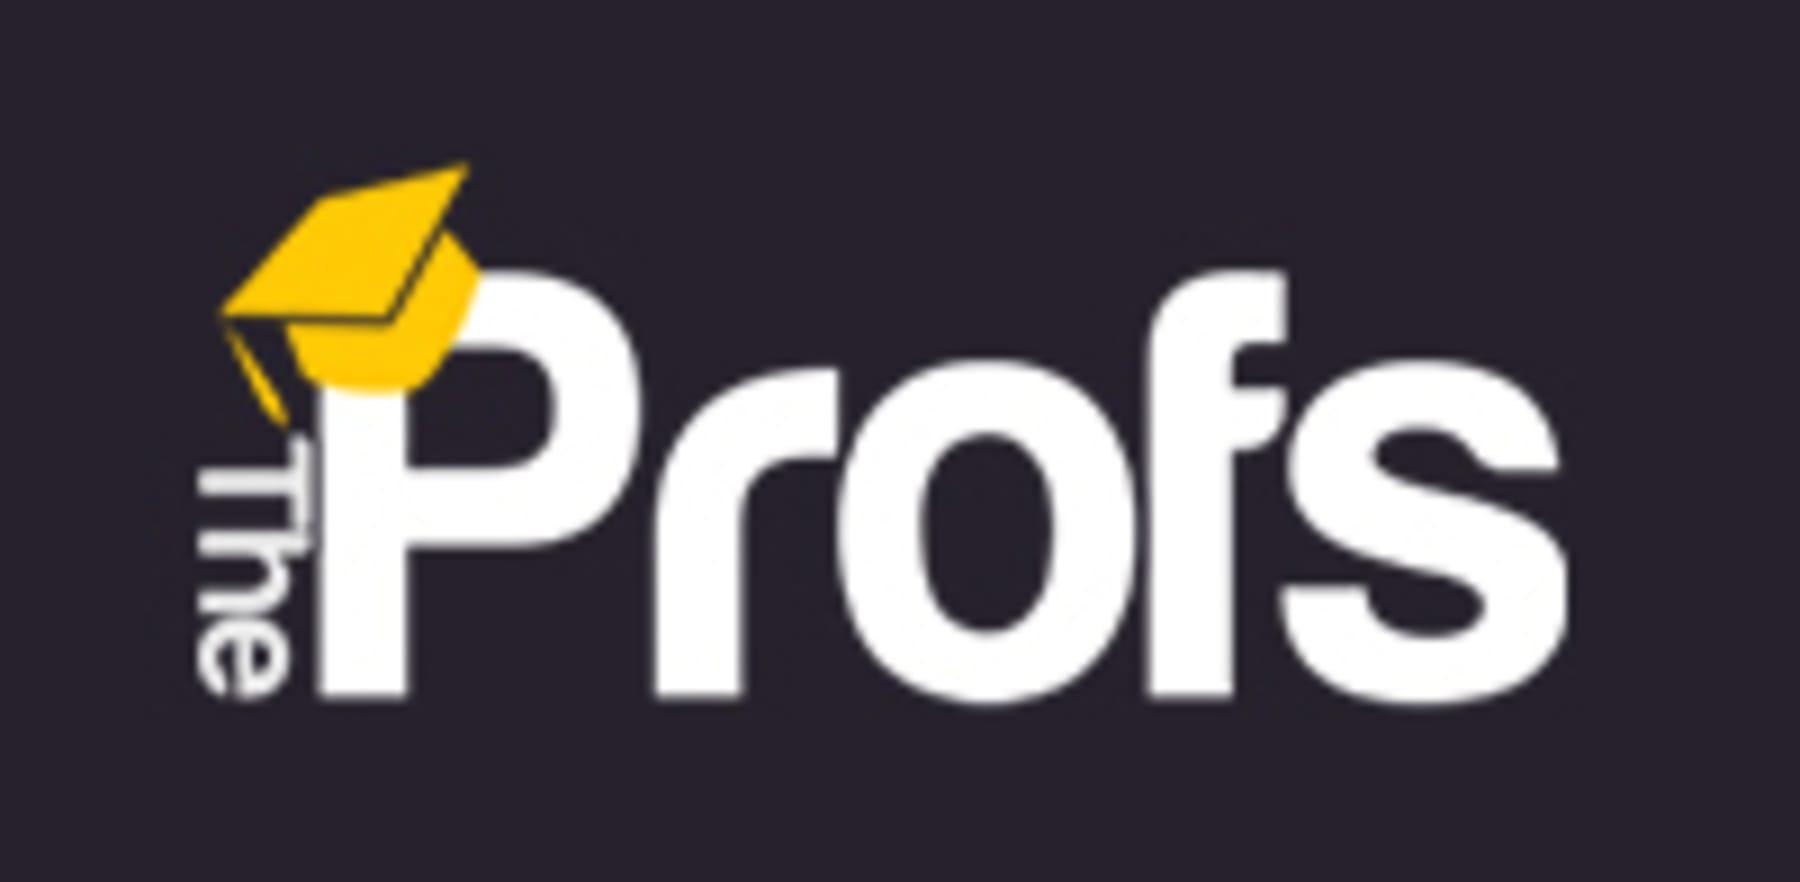 The Profs